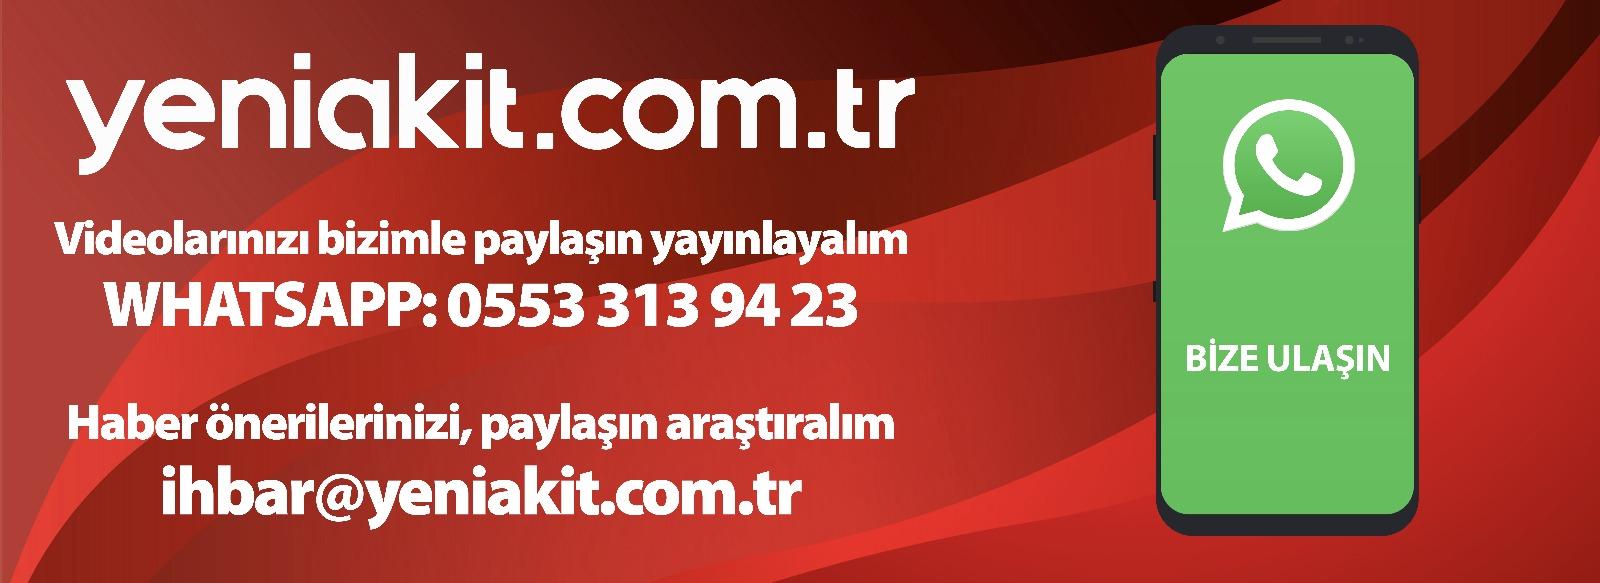 Akit - WhatsApp İhbar Hattı